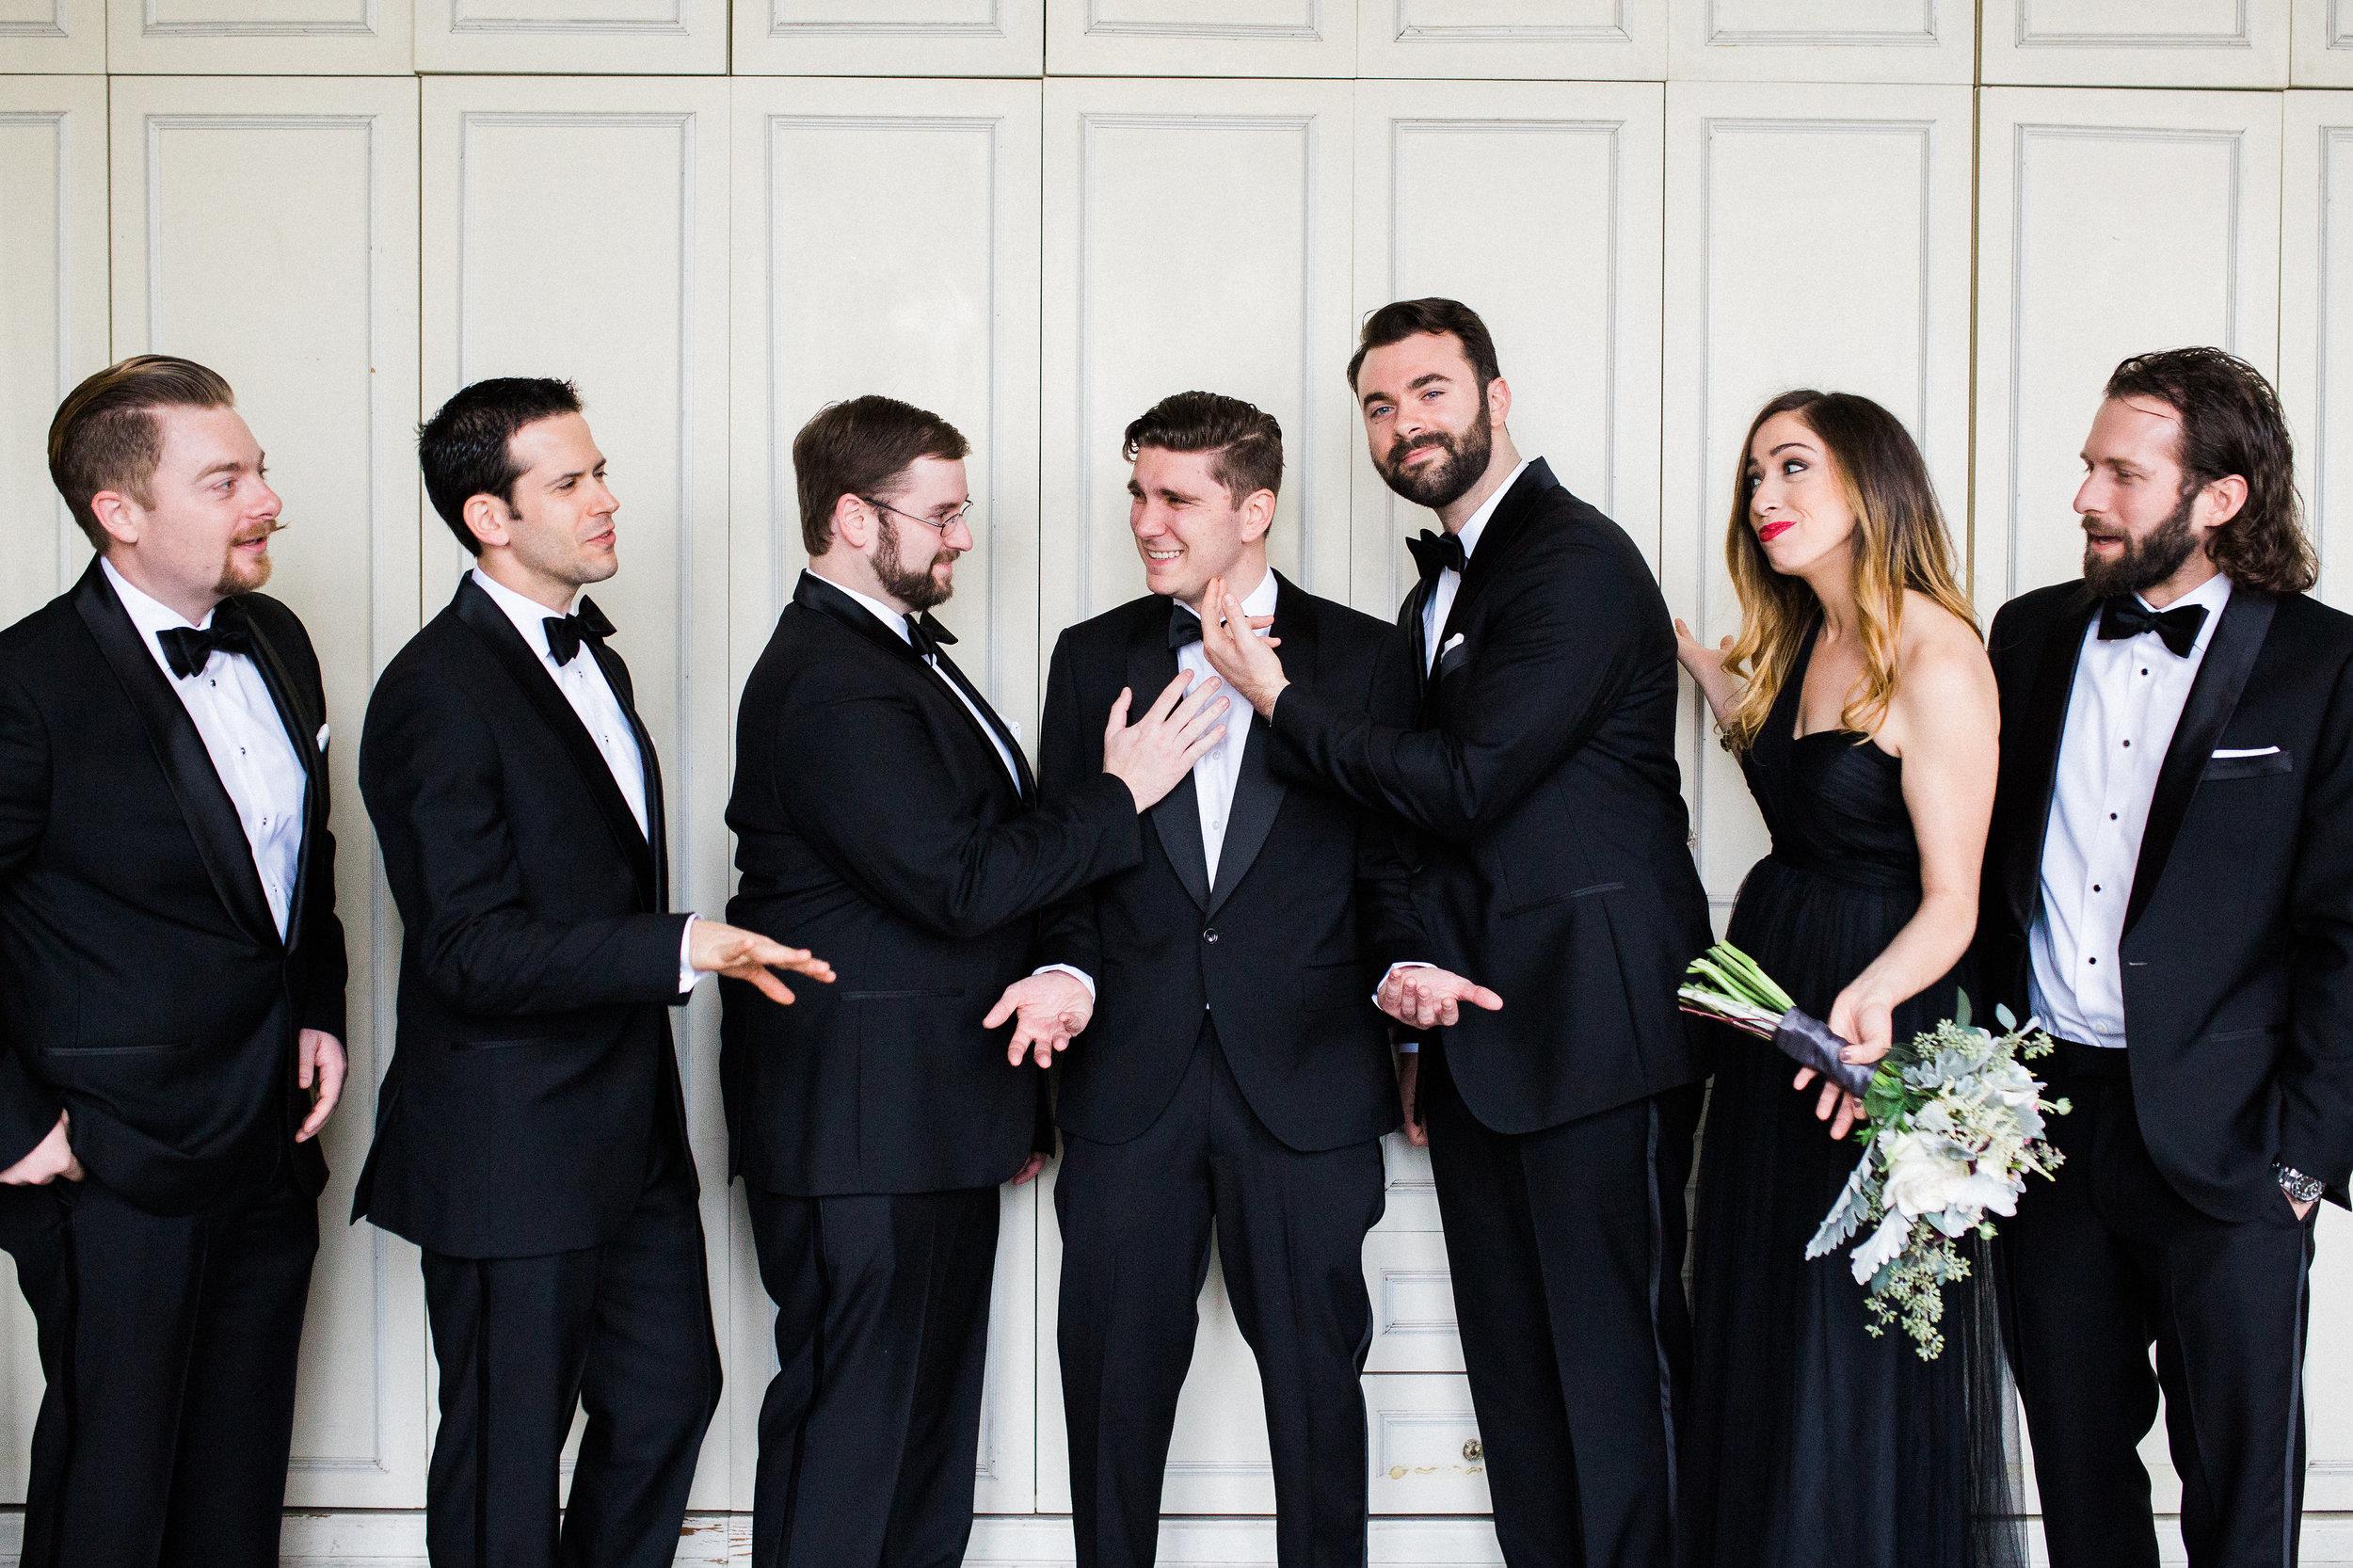 sam-and-jon_metropolitan-building-nyc-wedding-25-5.jpg